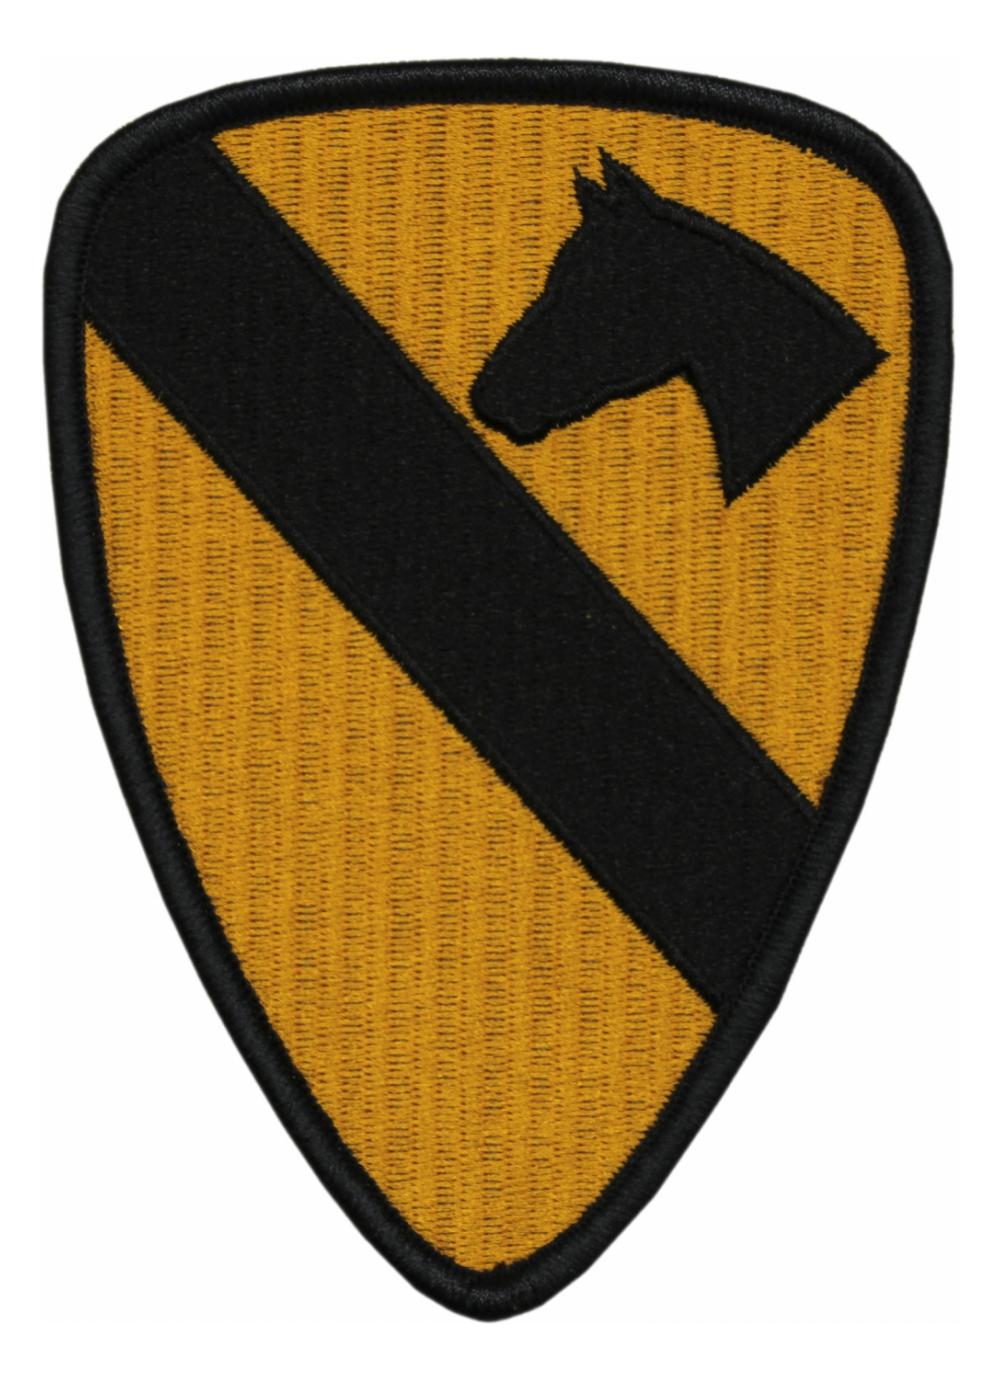 Special Forces Patches Vietnam